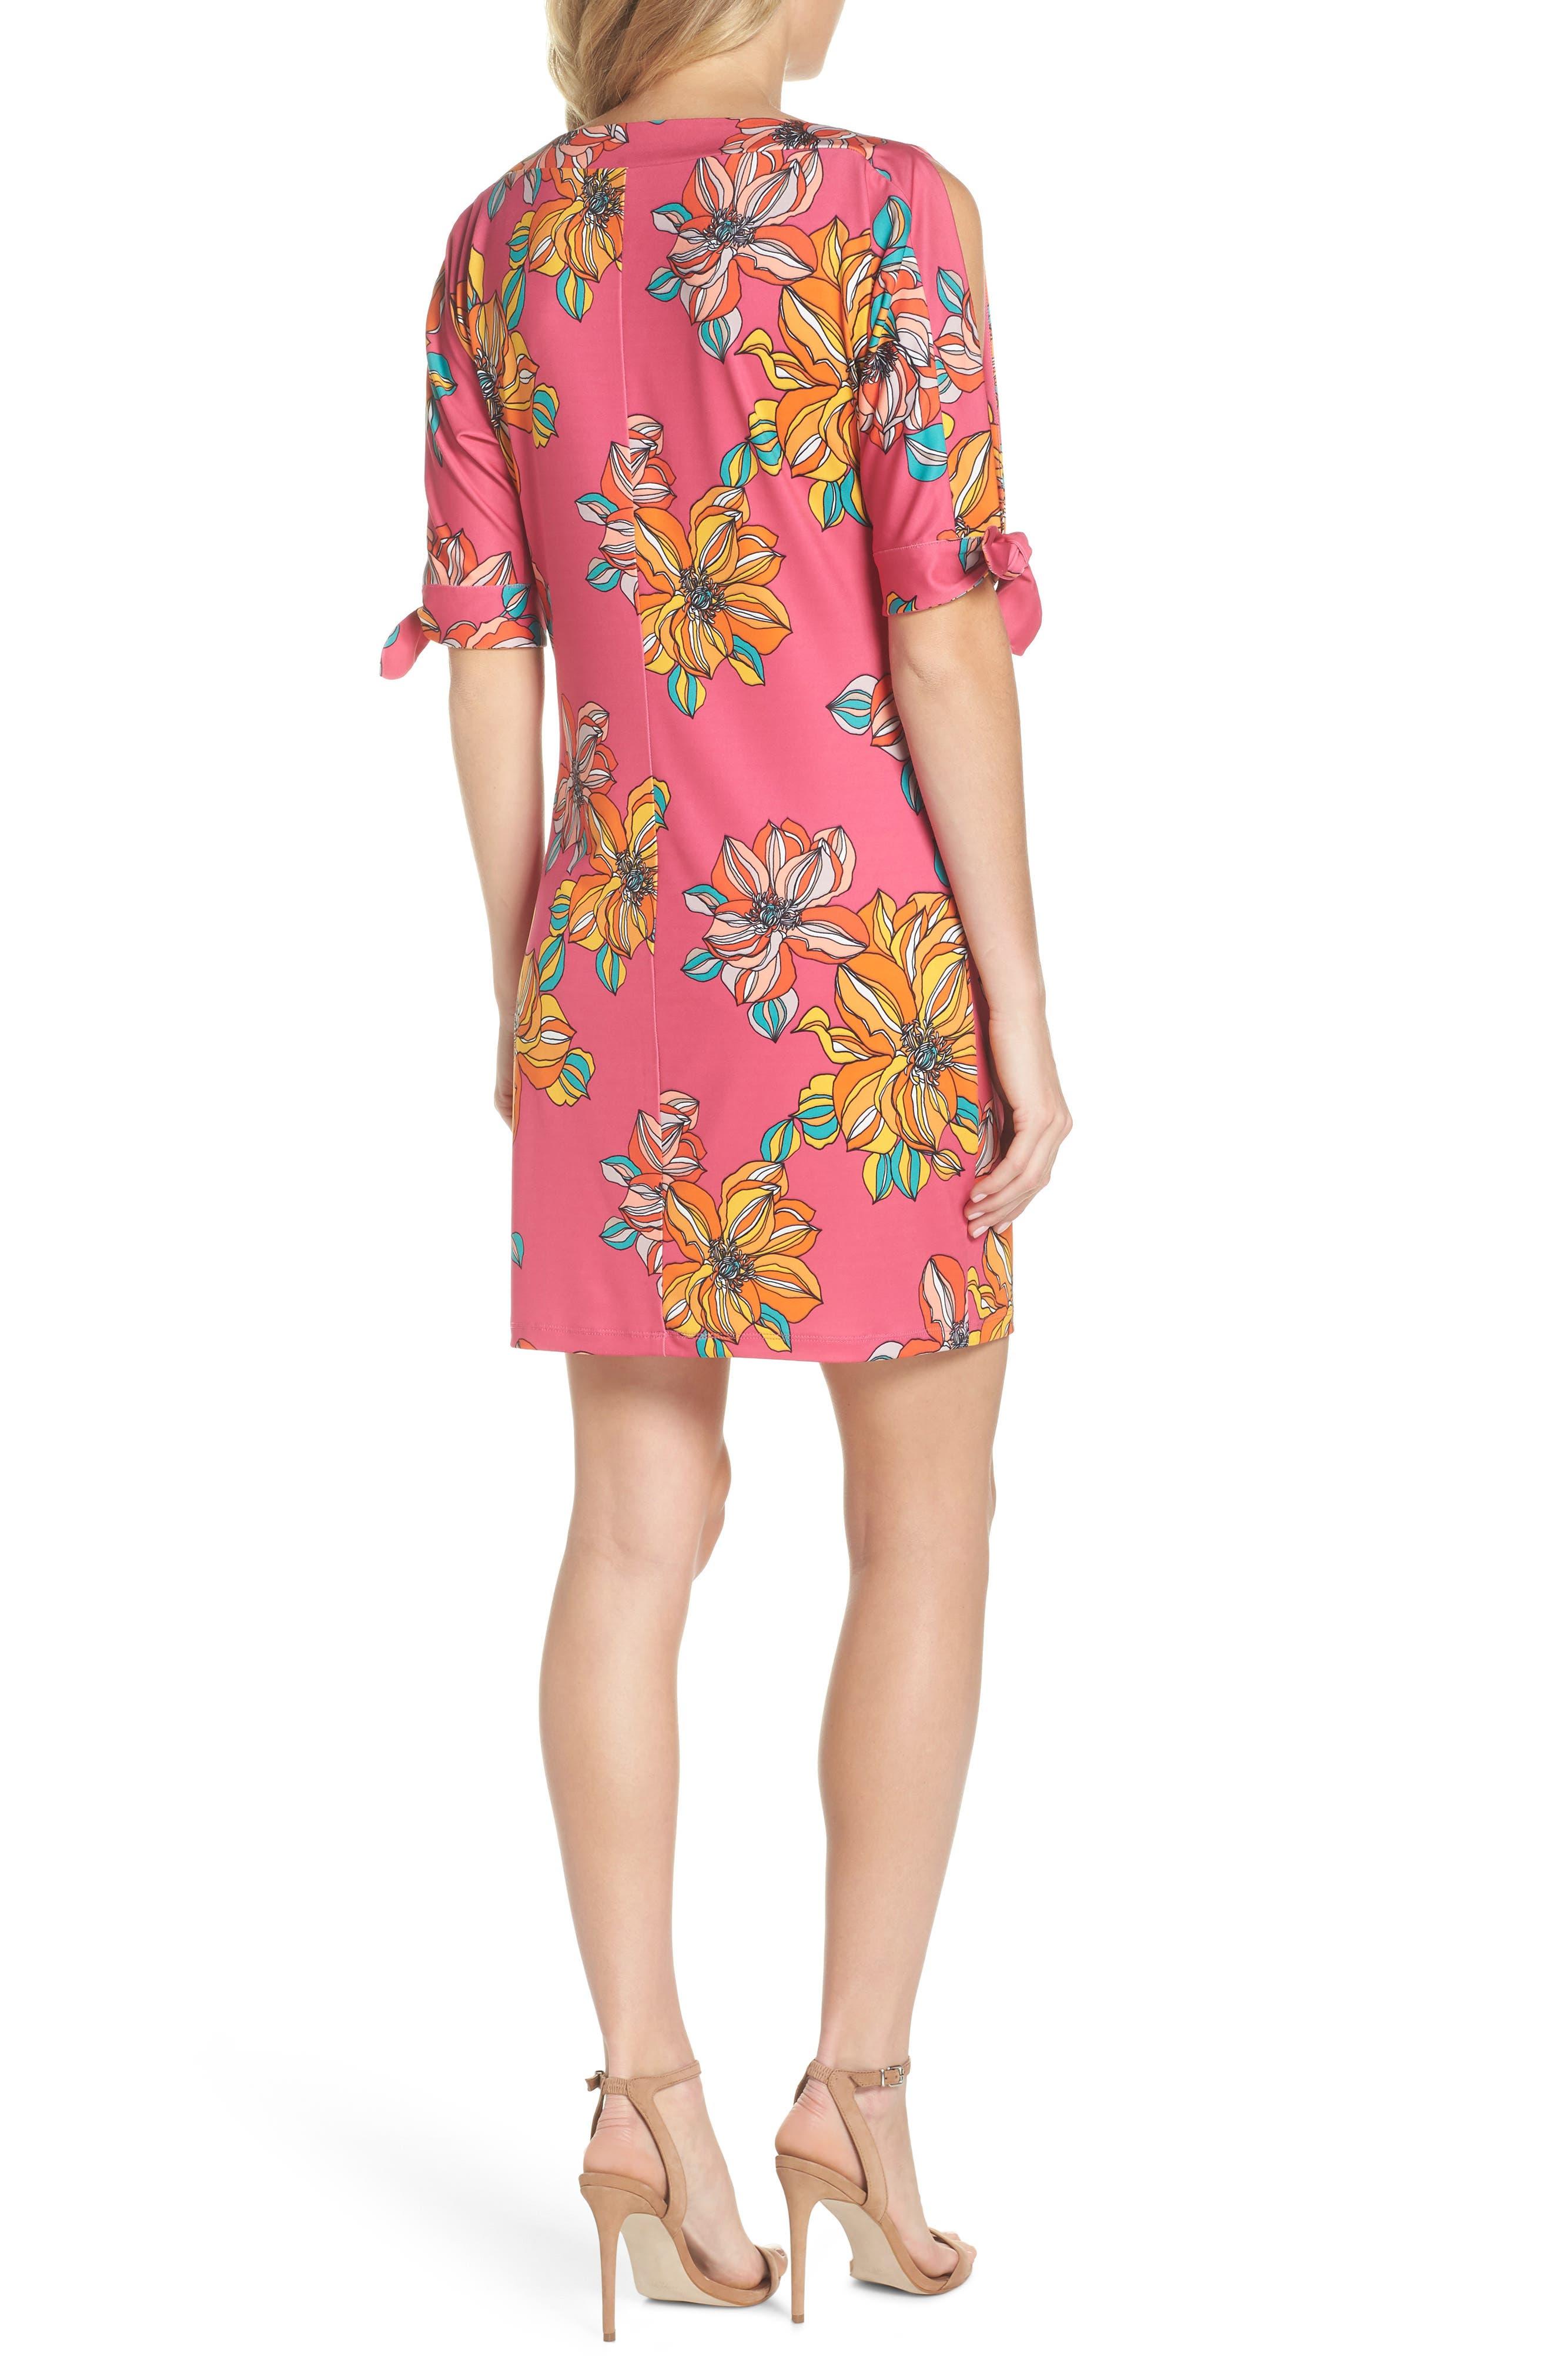 Vinet Floral Jersey Dress,                             Alternate thumbnail 2, color,                             650